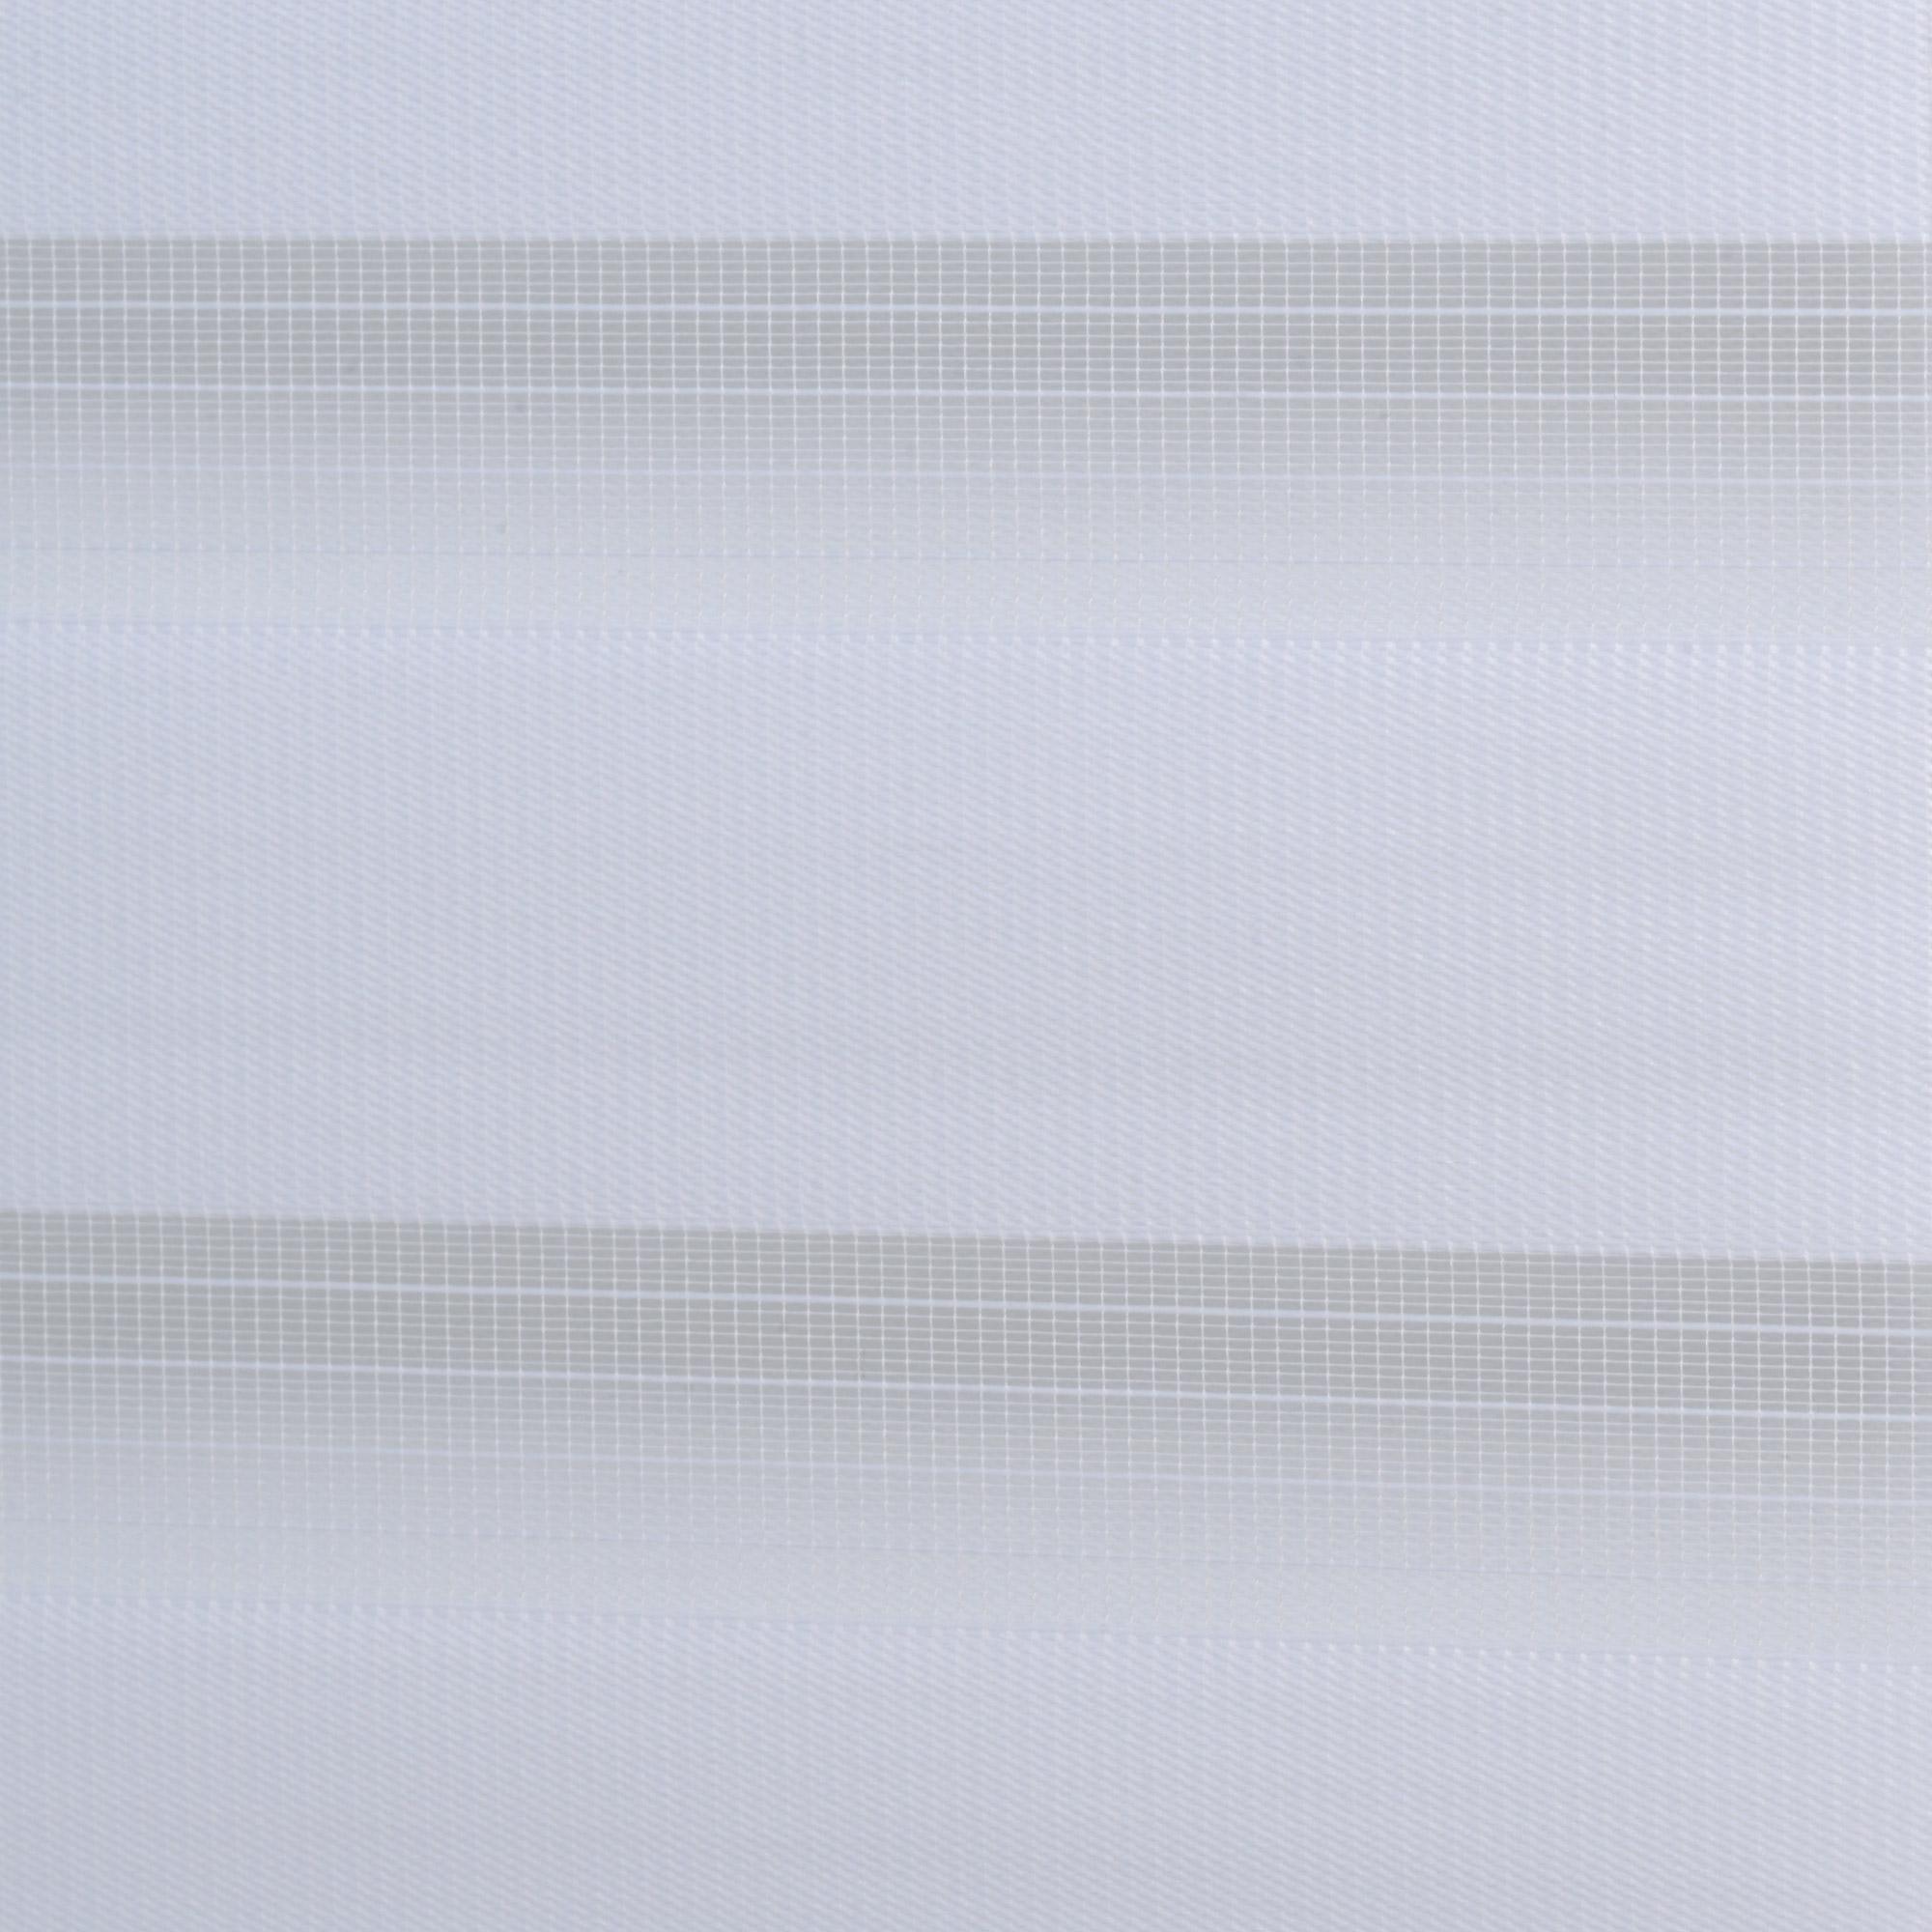 doppelrollo klemmfix ohne bohren vario duo rollo klemmrollo kettenzug fenster ebay. Black Bedroom Furniture Sets. Home Design Ideas